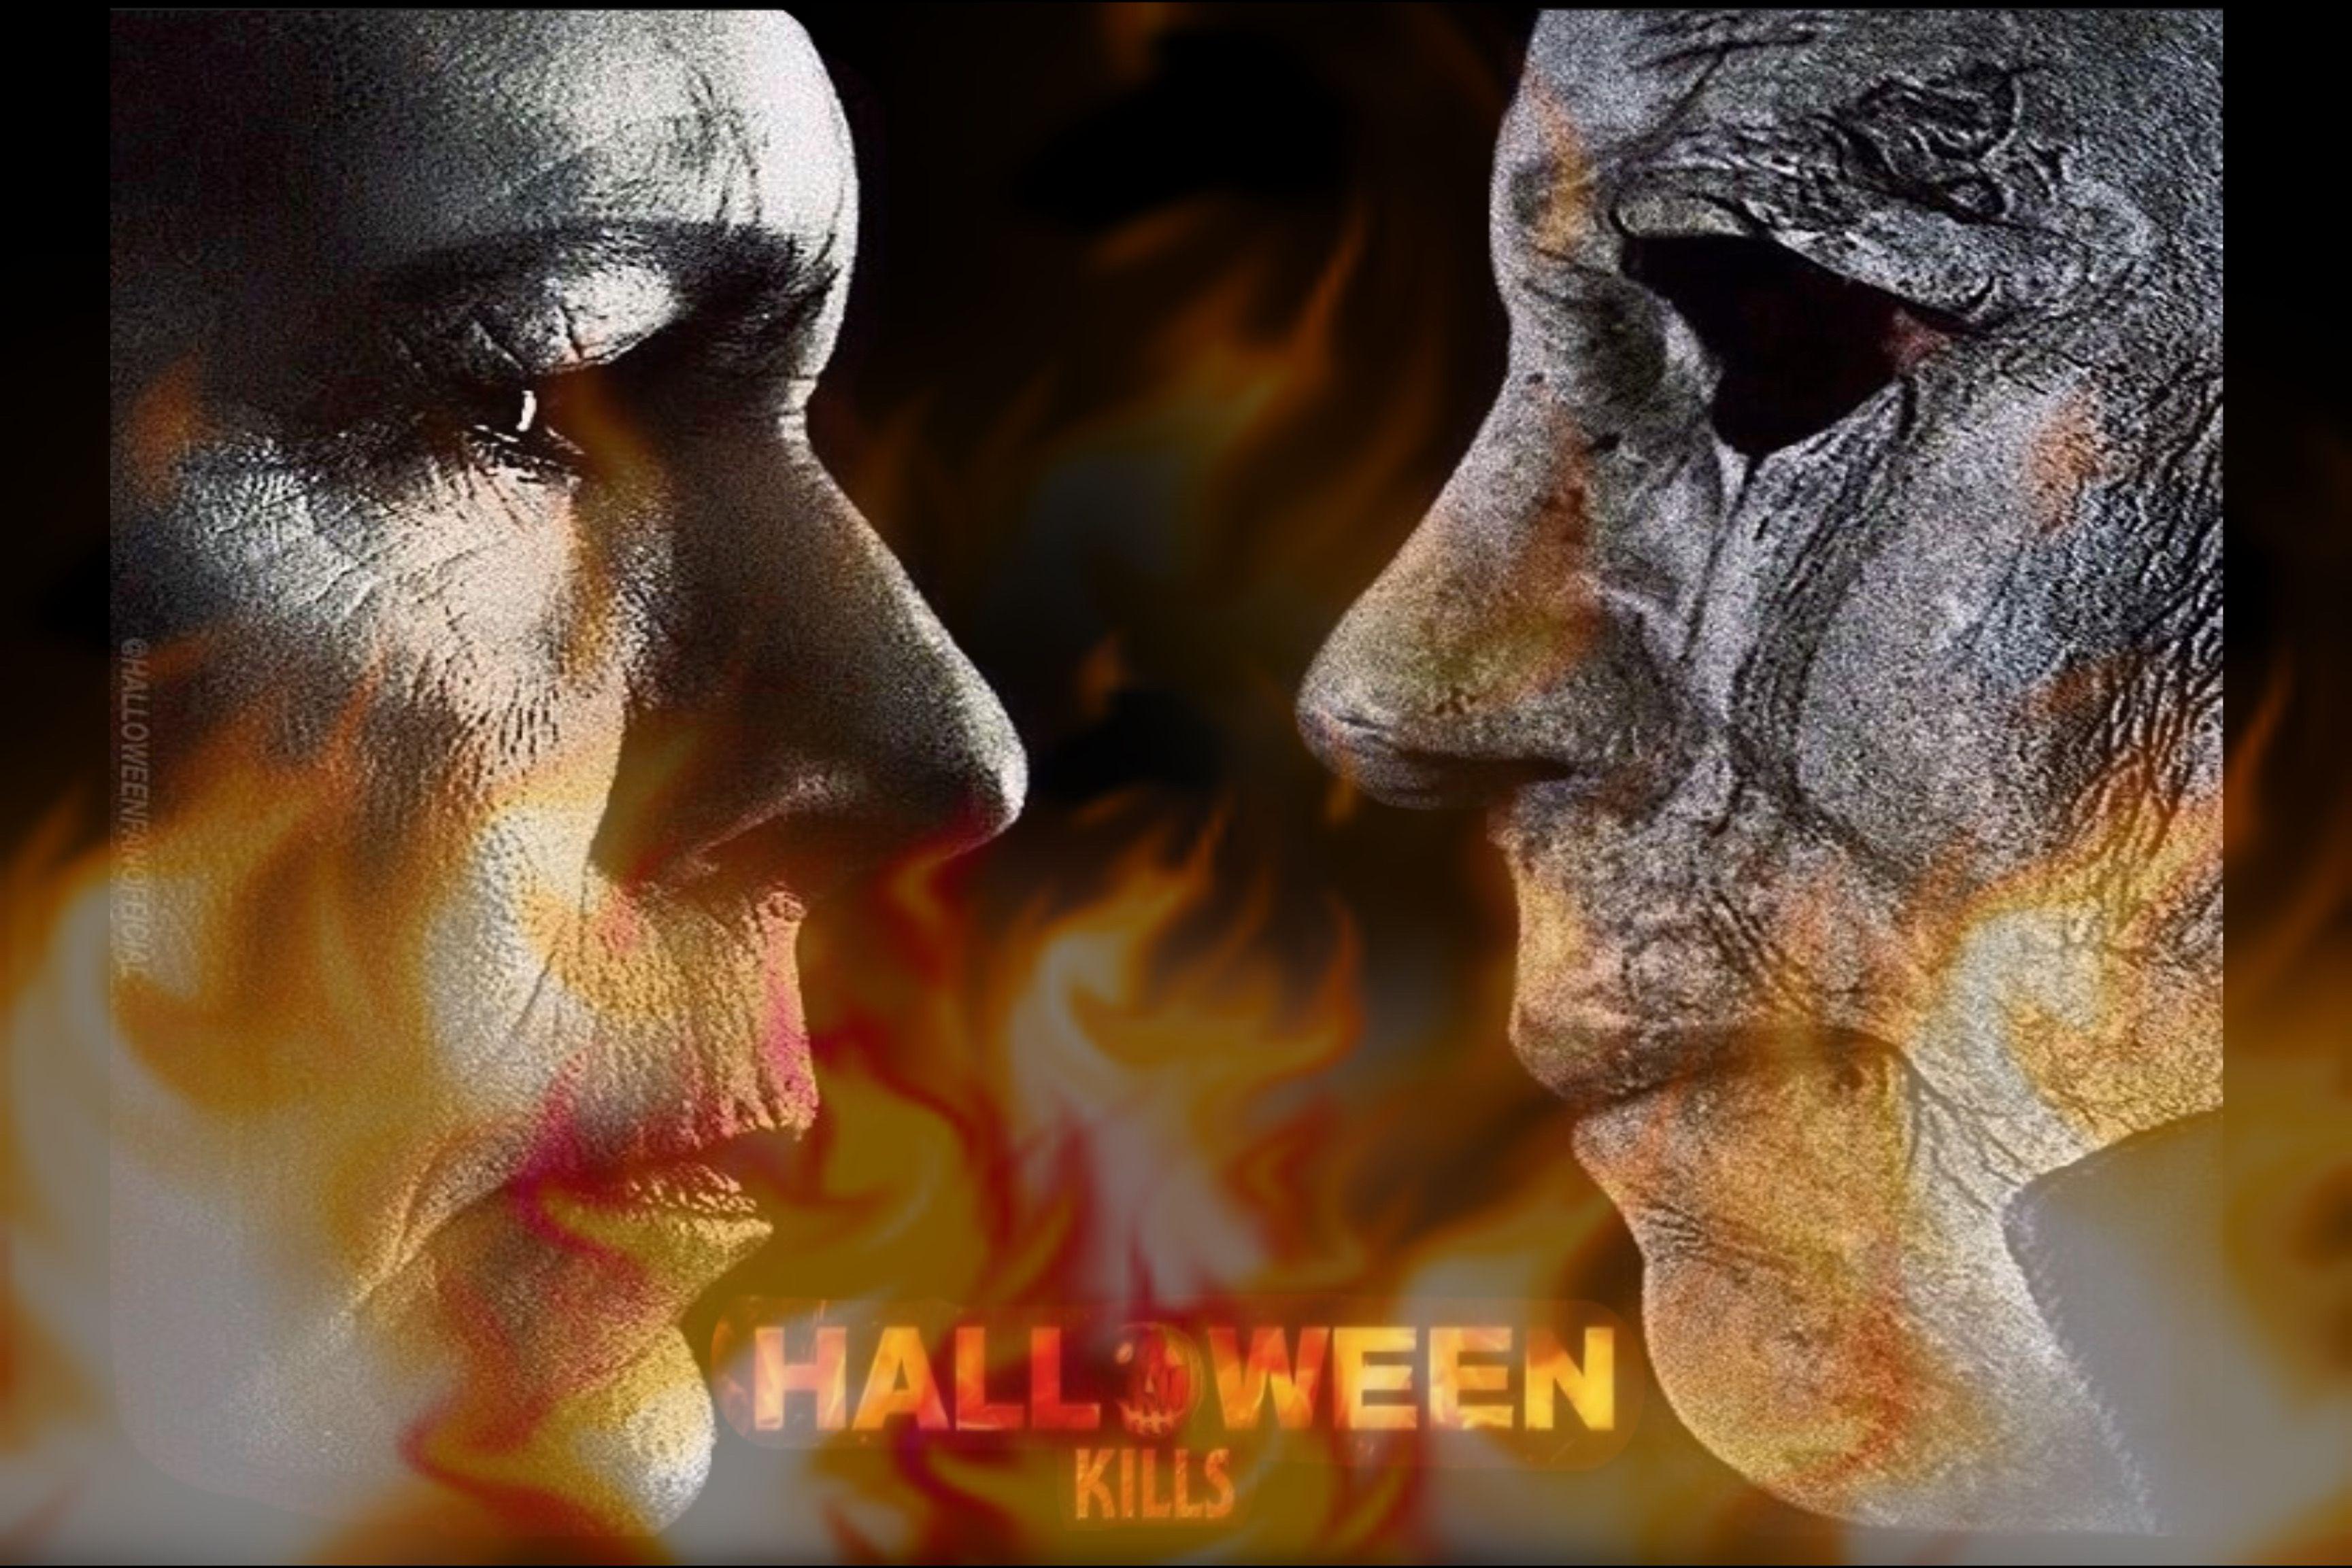 Halloween kills poster in 2020 Halloween, Movie posters